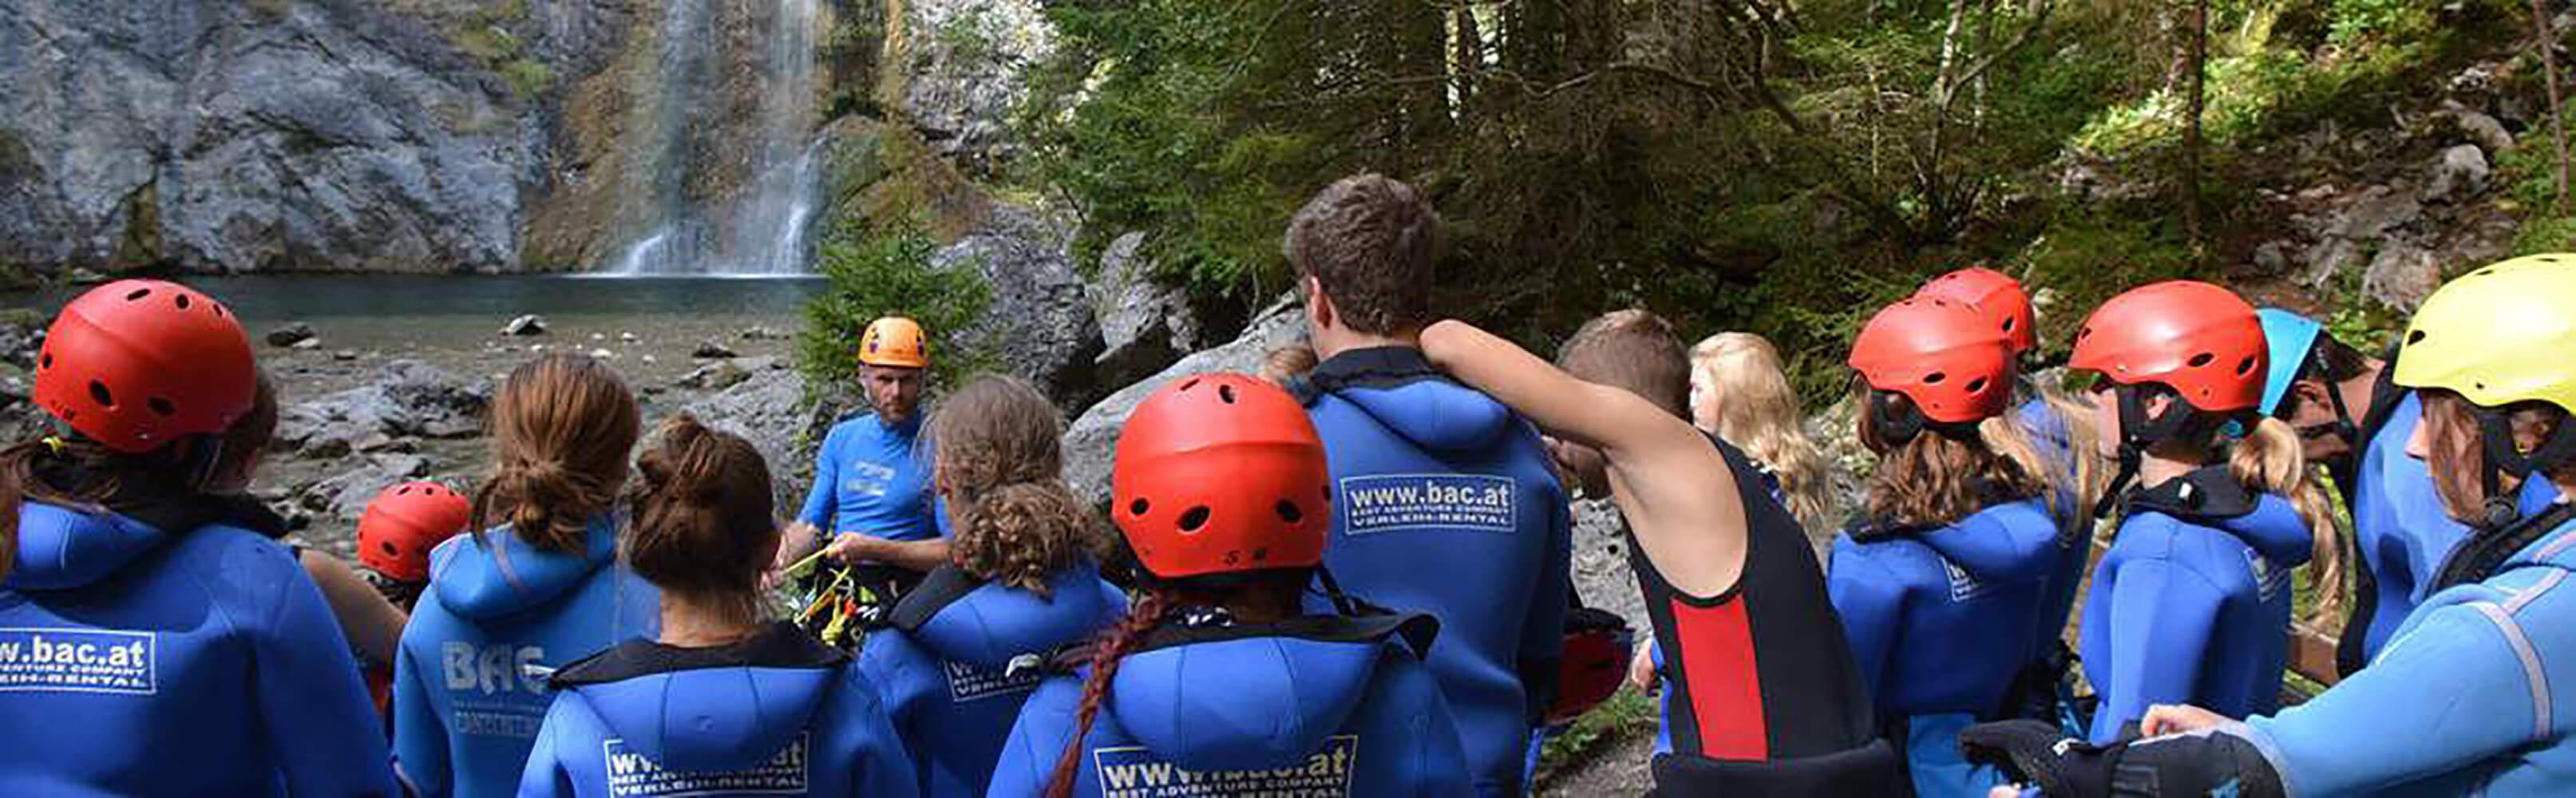 BAC - Best Adventure Company – der Outdoor Spass in Gröbming 1